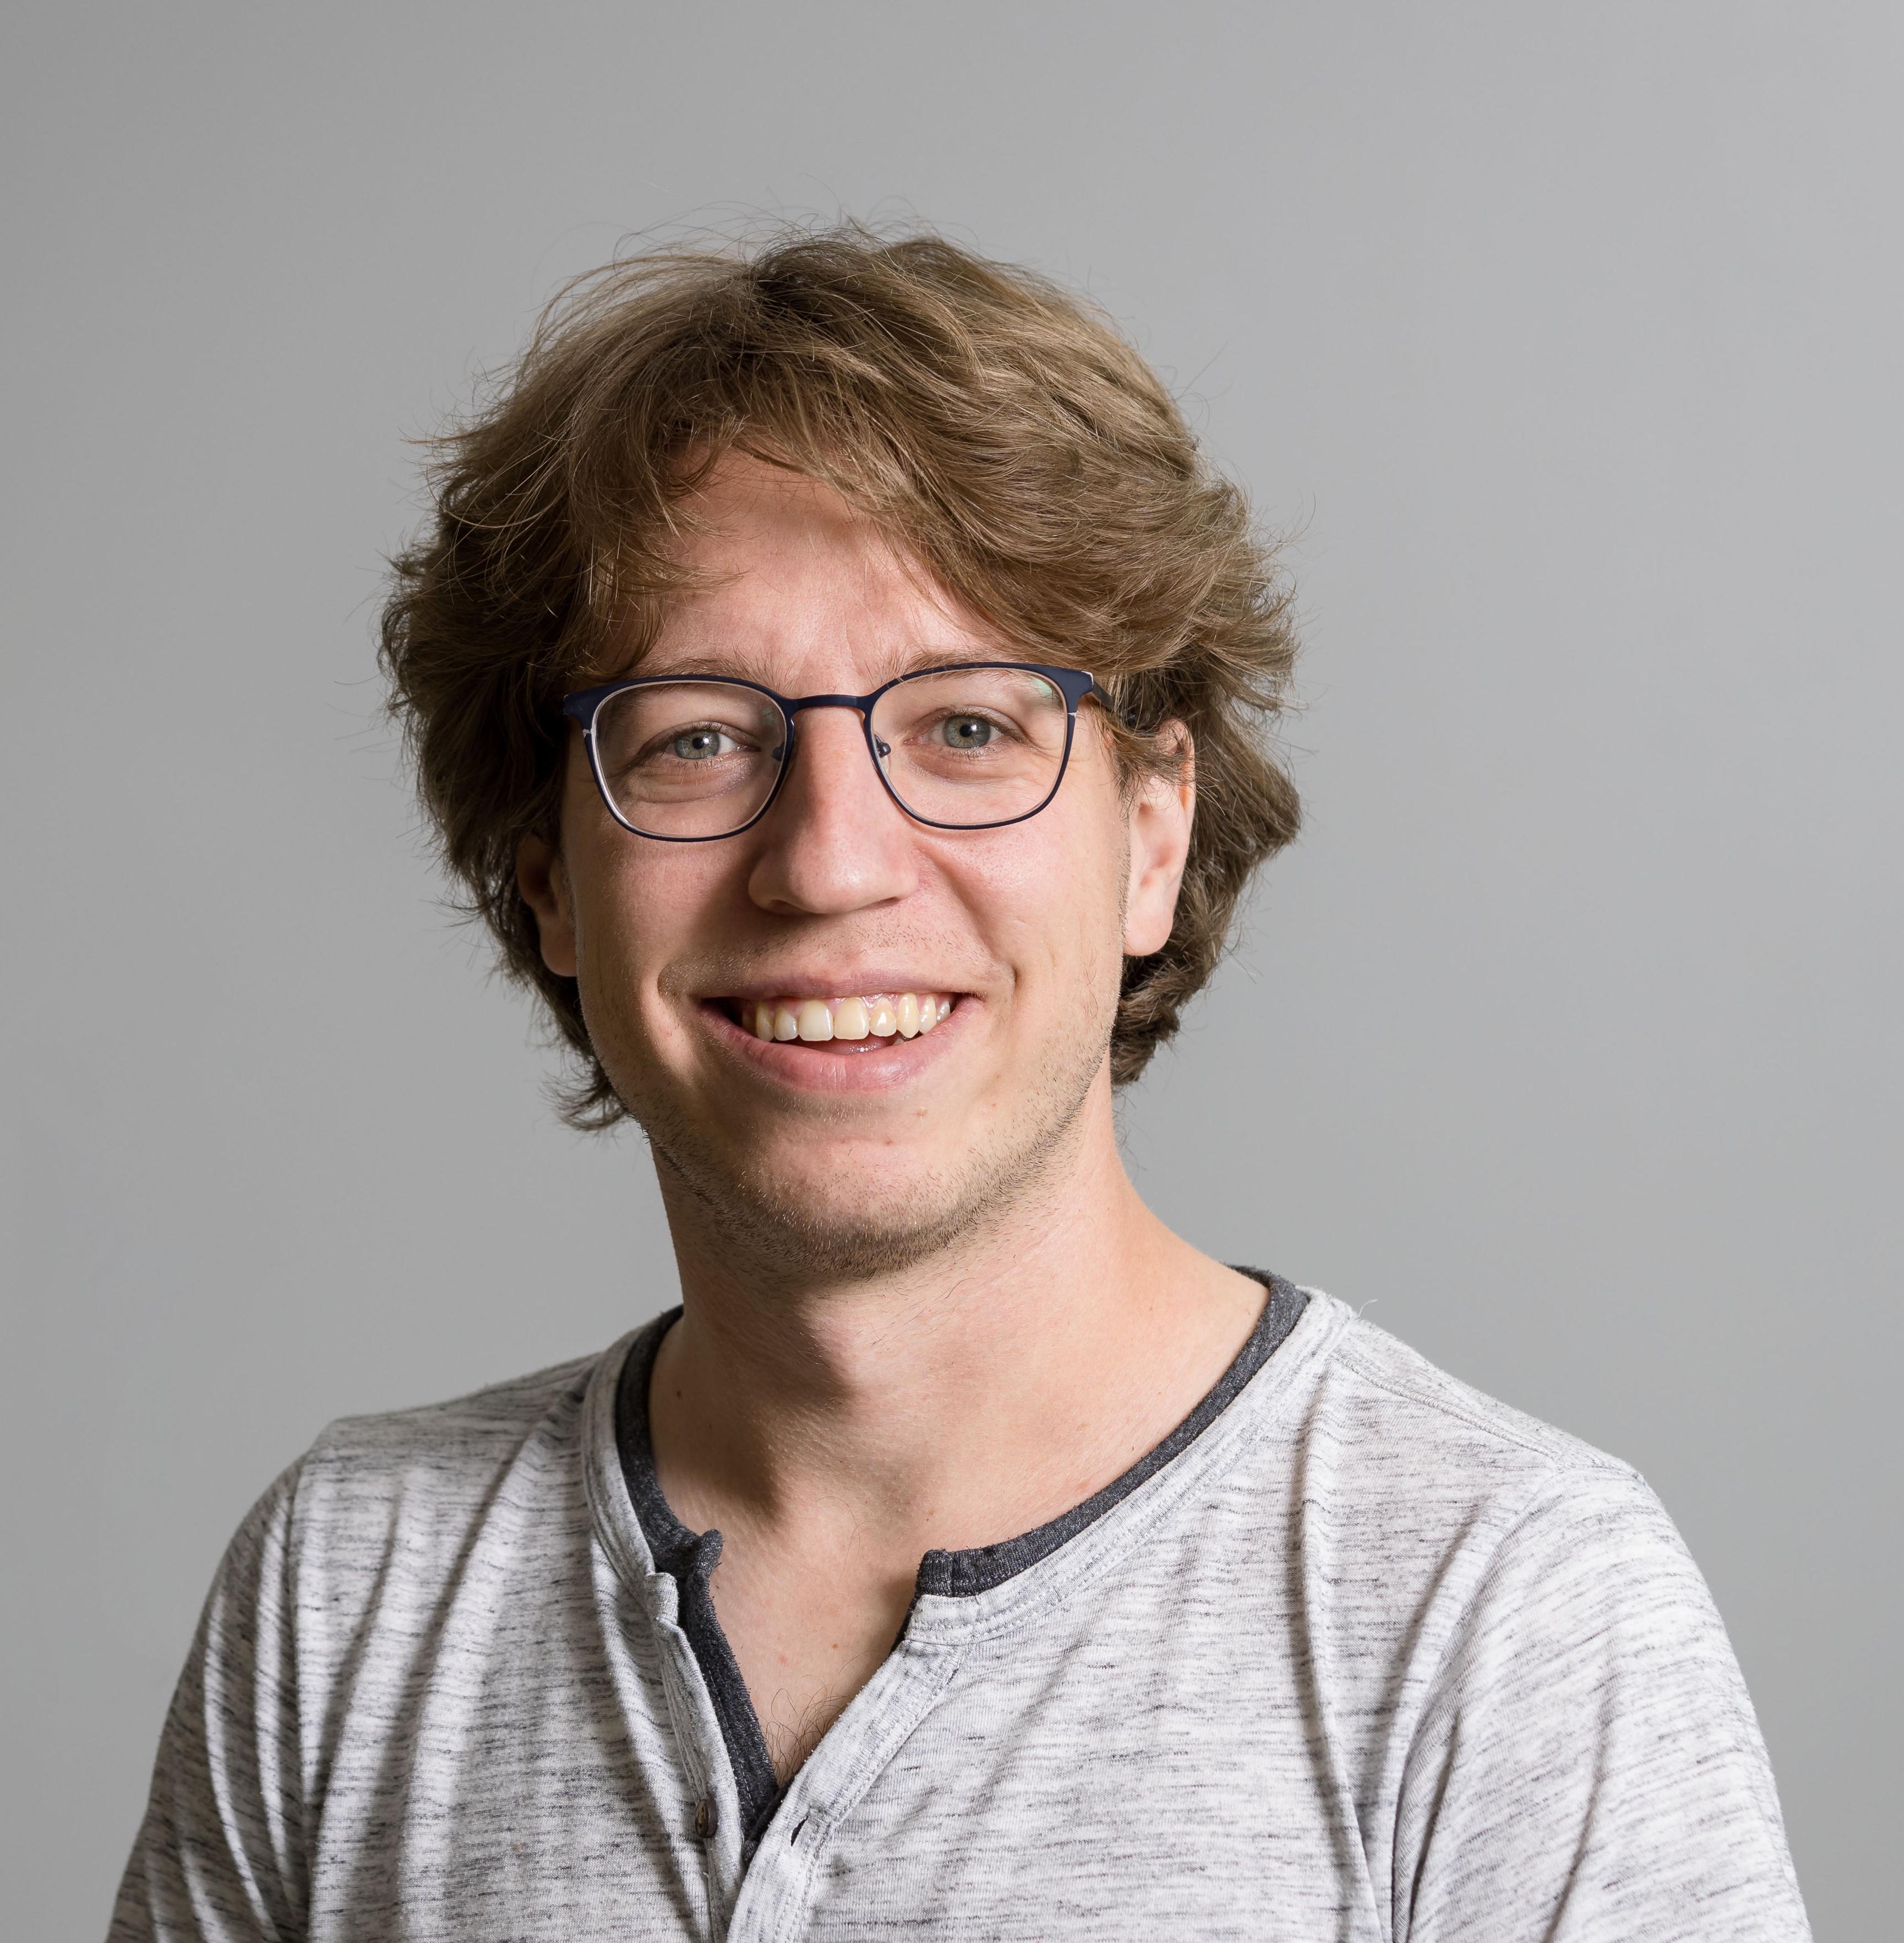 Sebastian Junges